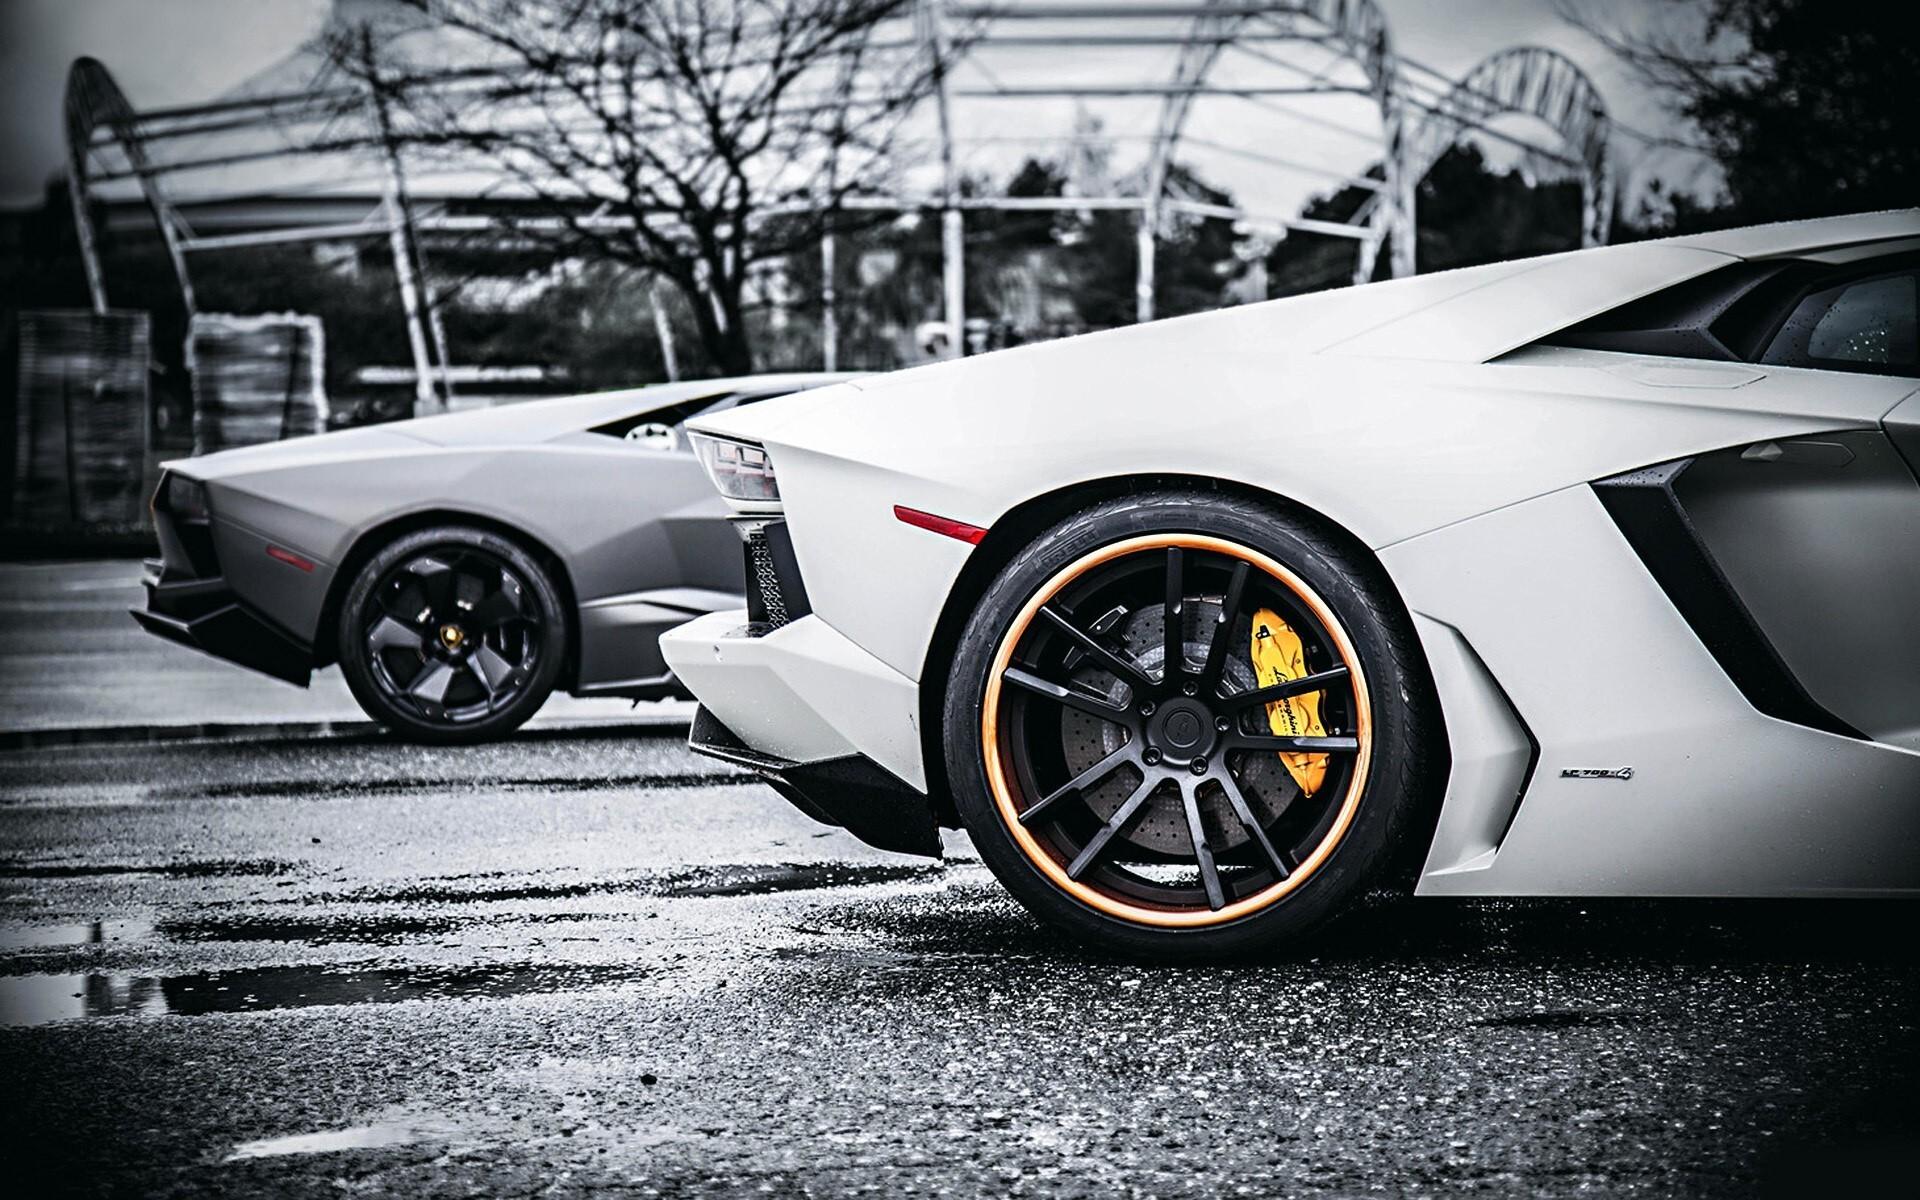 Lamborghini Rear Side View Hd Wallpaper Hd Wallpapers